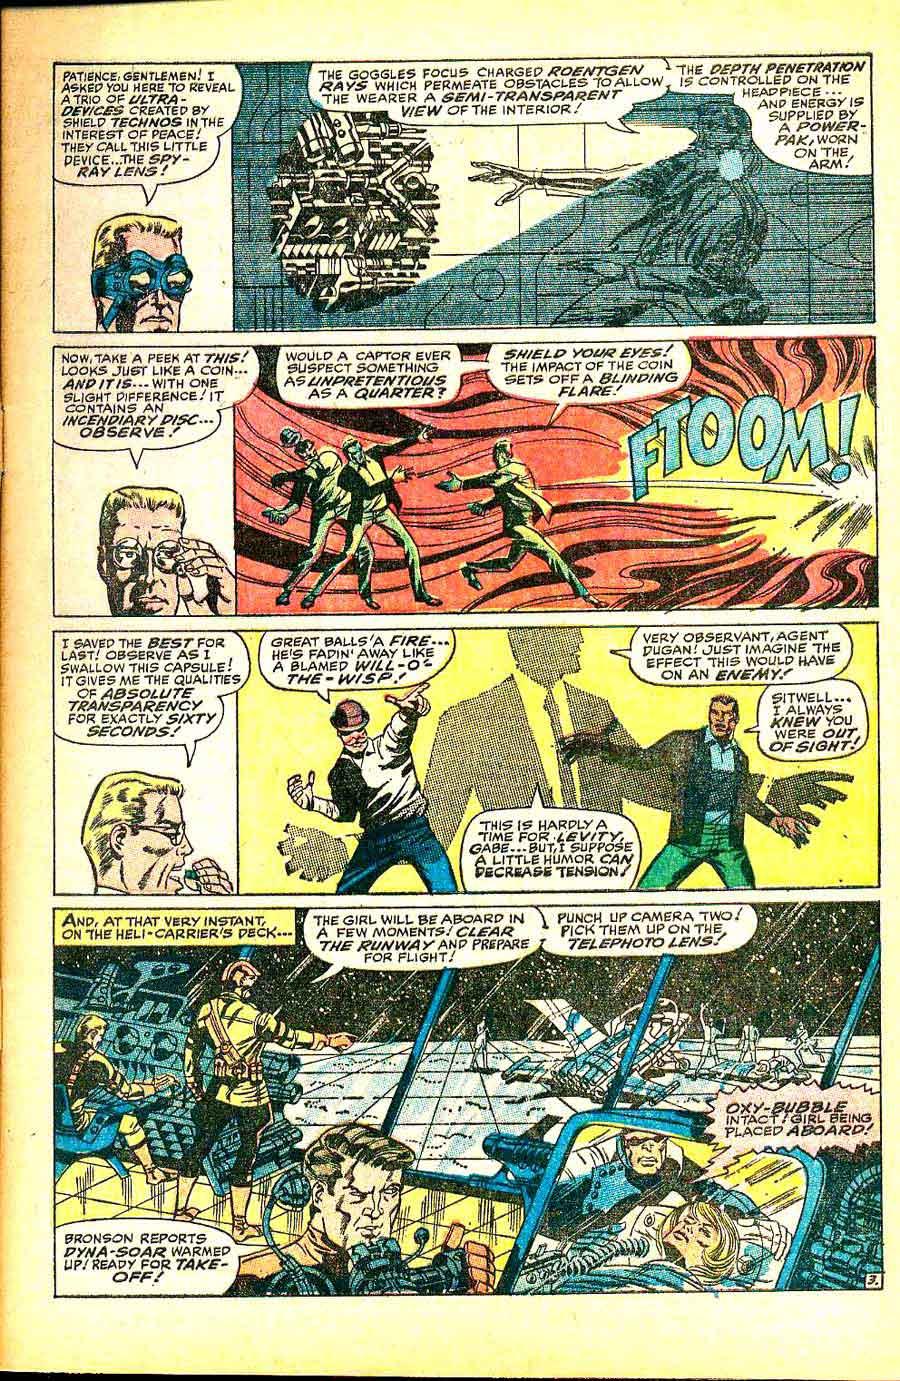 Strange Tales v1 #156 nick fury shield comic book page art by Jim Steranko